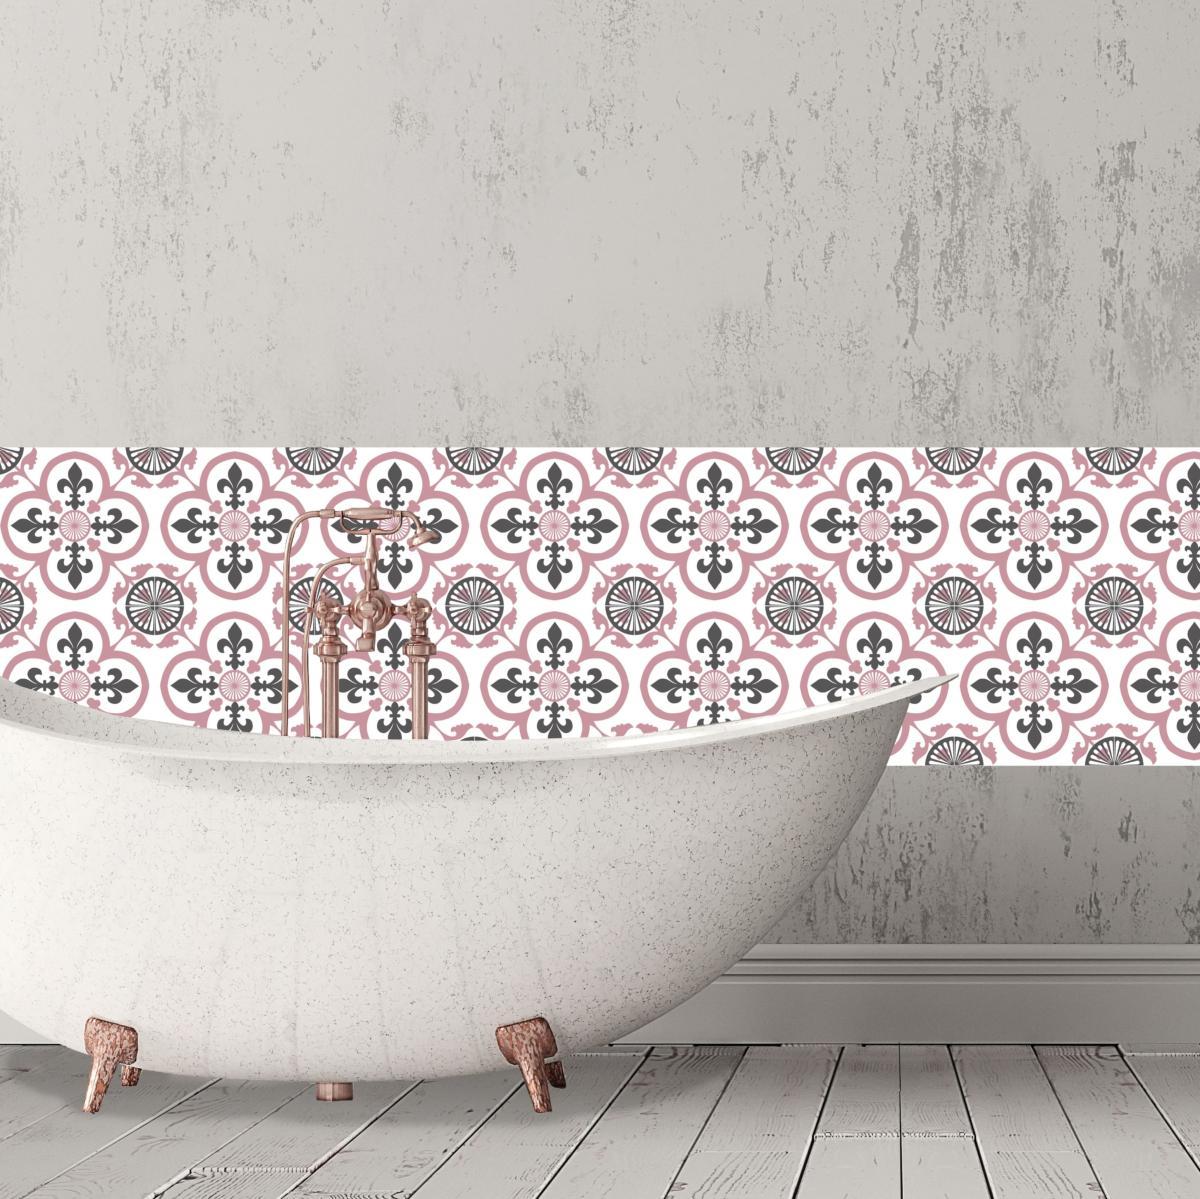 cr dence adh sive carreaux de ciment garance rose. Black Bedroom Furniture Sets. Home Design Ideas